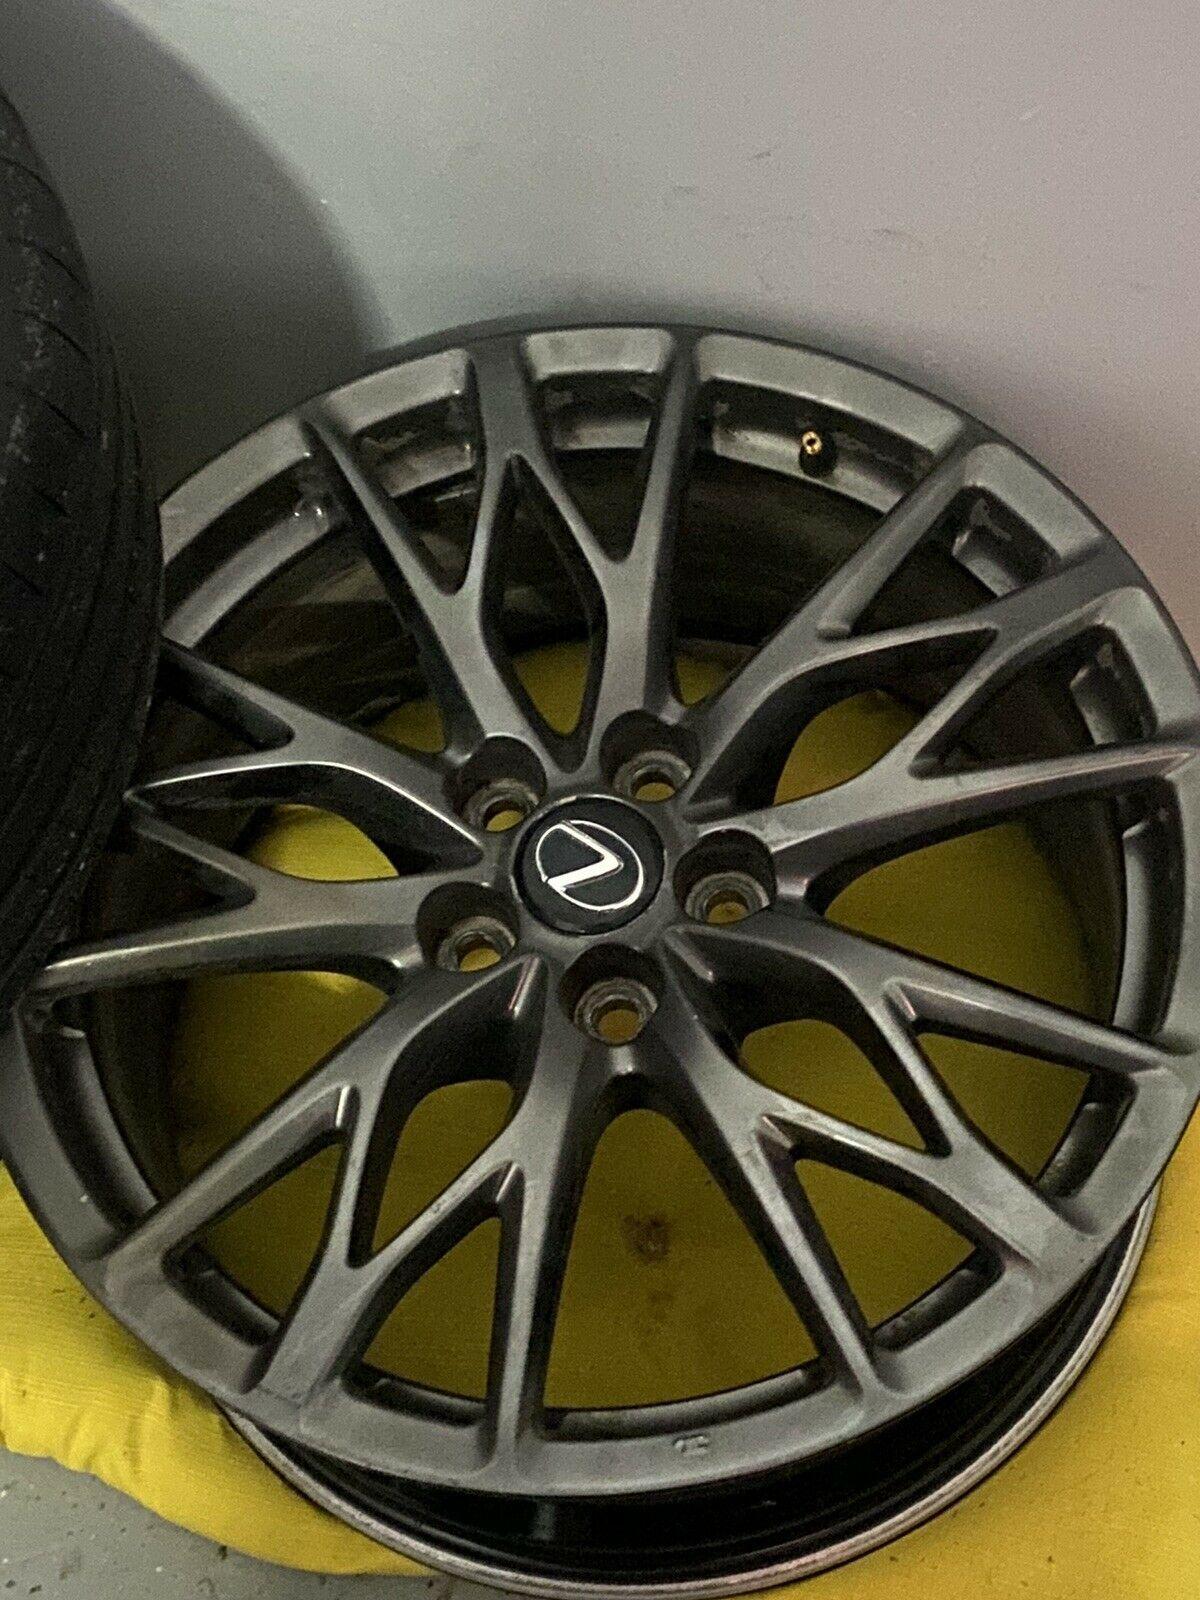 Lexus Isf Rims In 2020 Lexus Isf Lexus Lexus Wheels